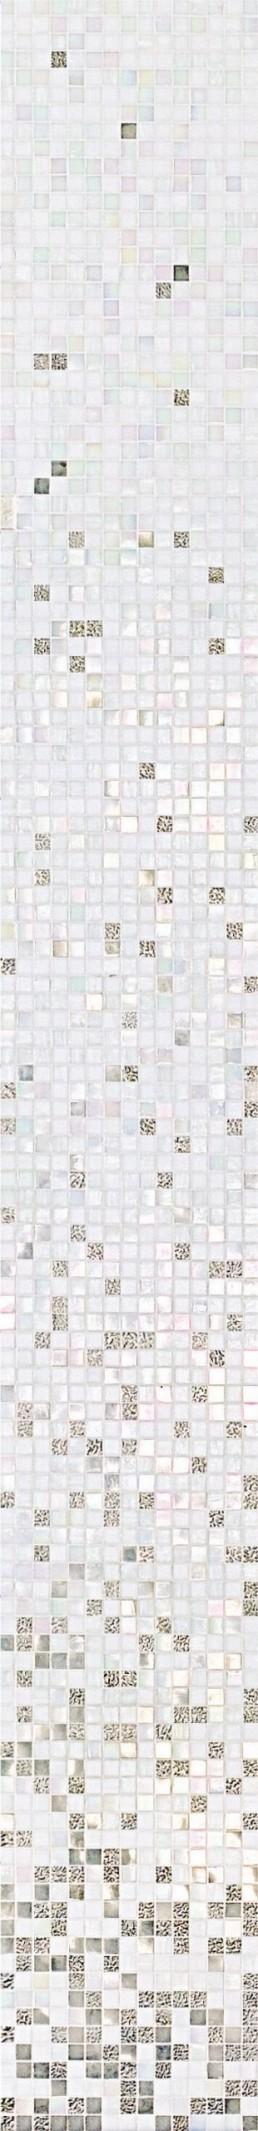 Bisazza NARCISO Swimming Pool Mosaic Blend